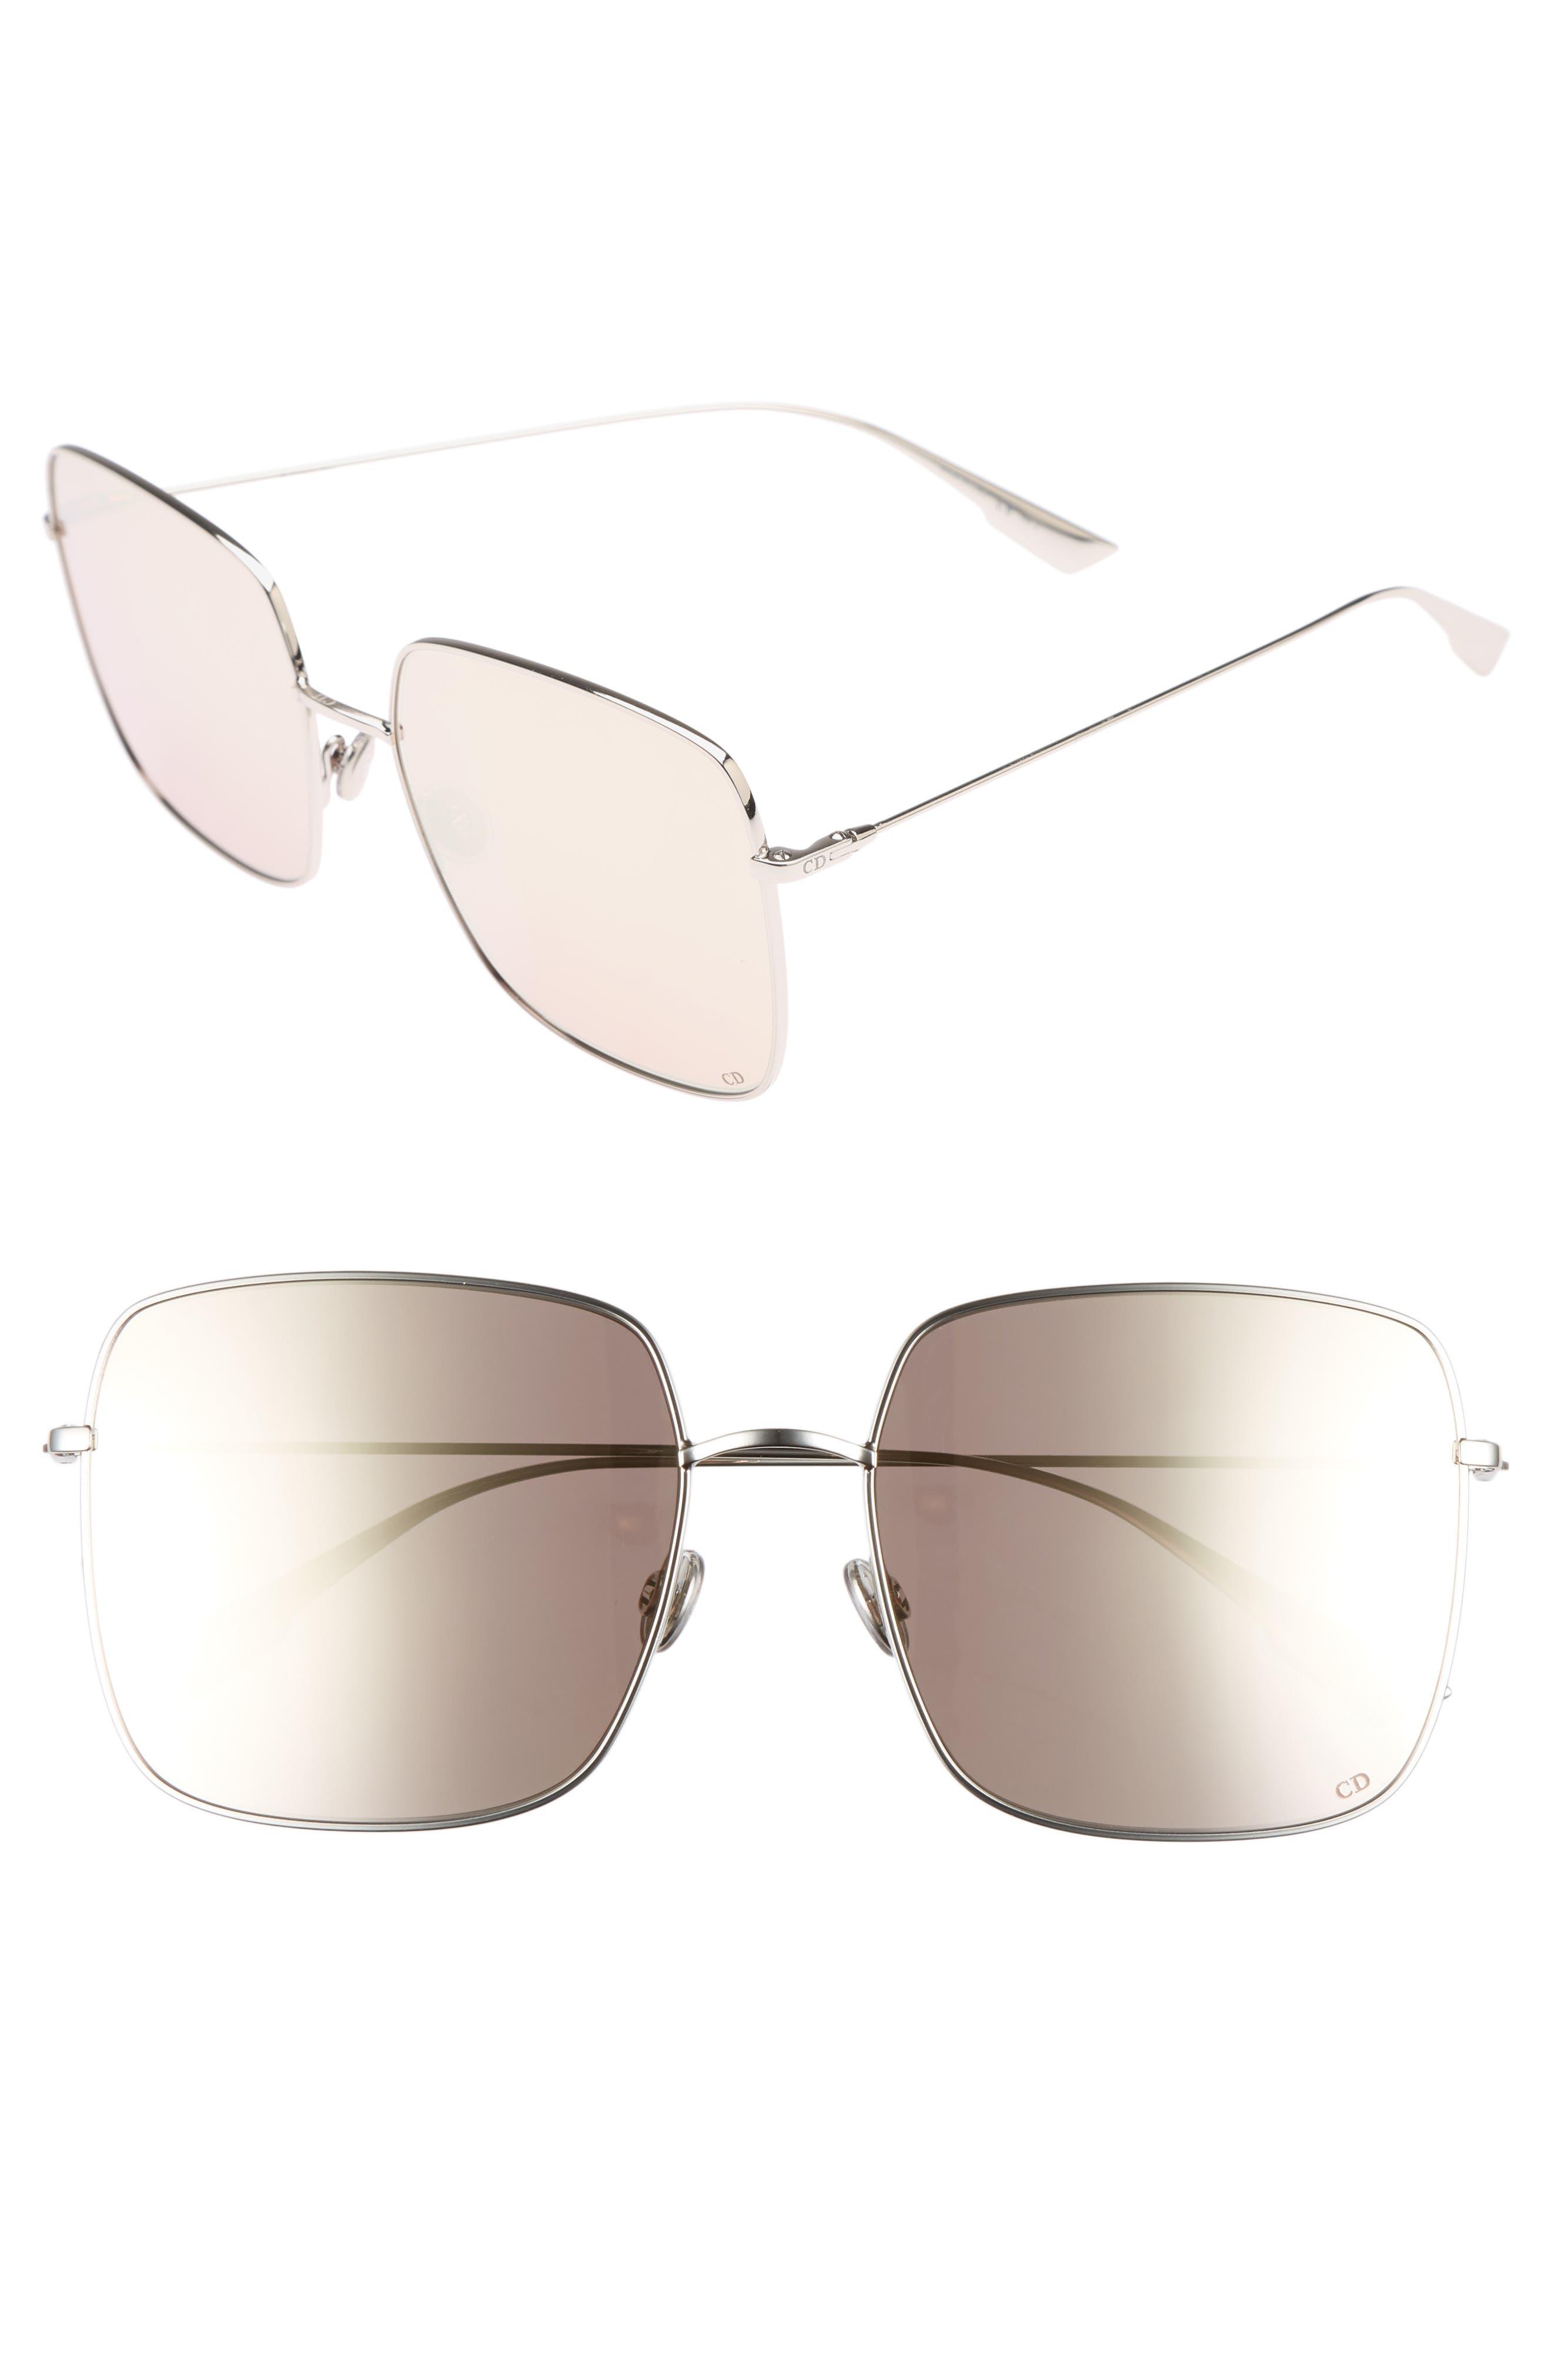 Stellaire 1 59mm Square Sunglasses,                             Main thumbnail 1, color,                             Palladium